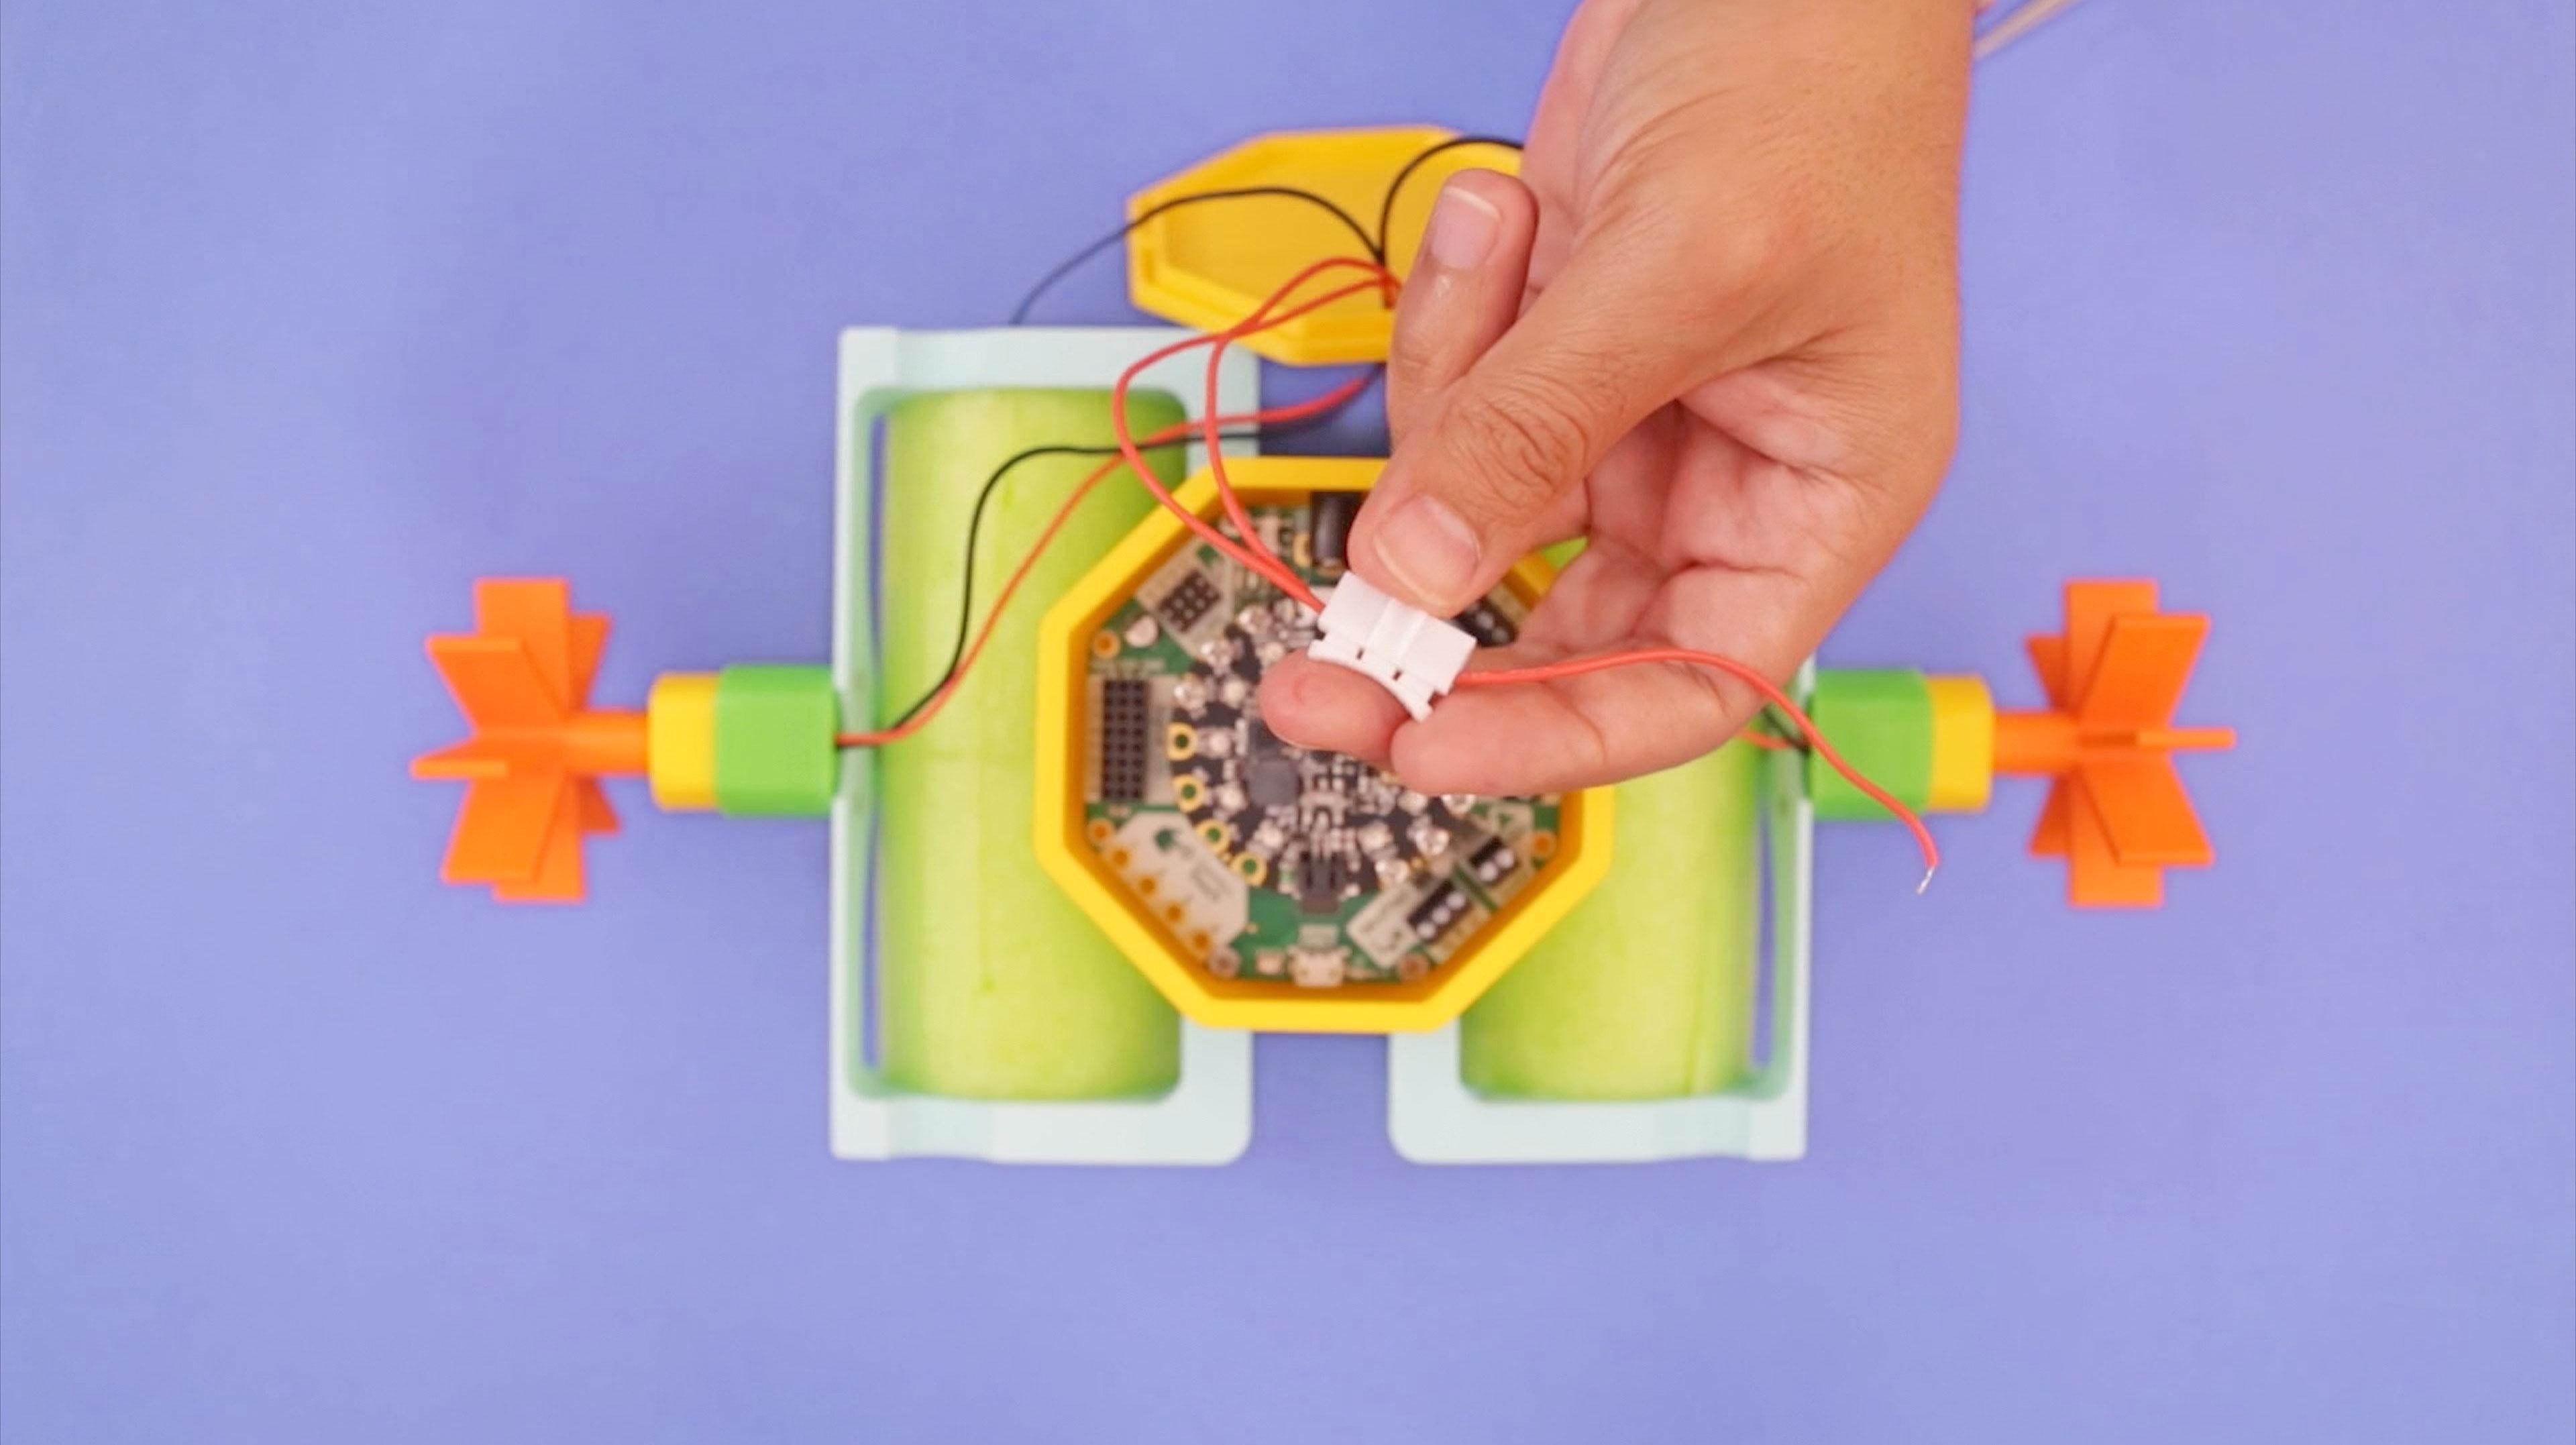 3d_printing_wire-splicer.jpg